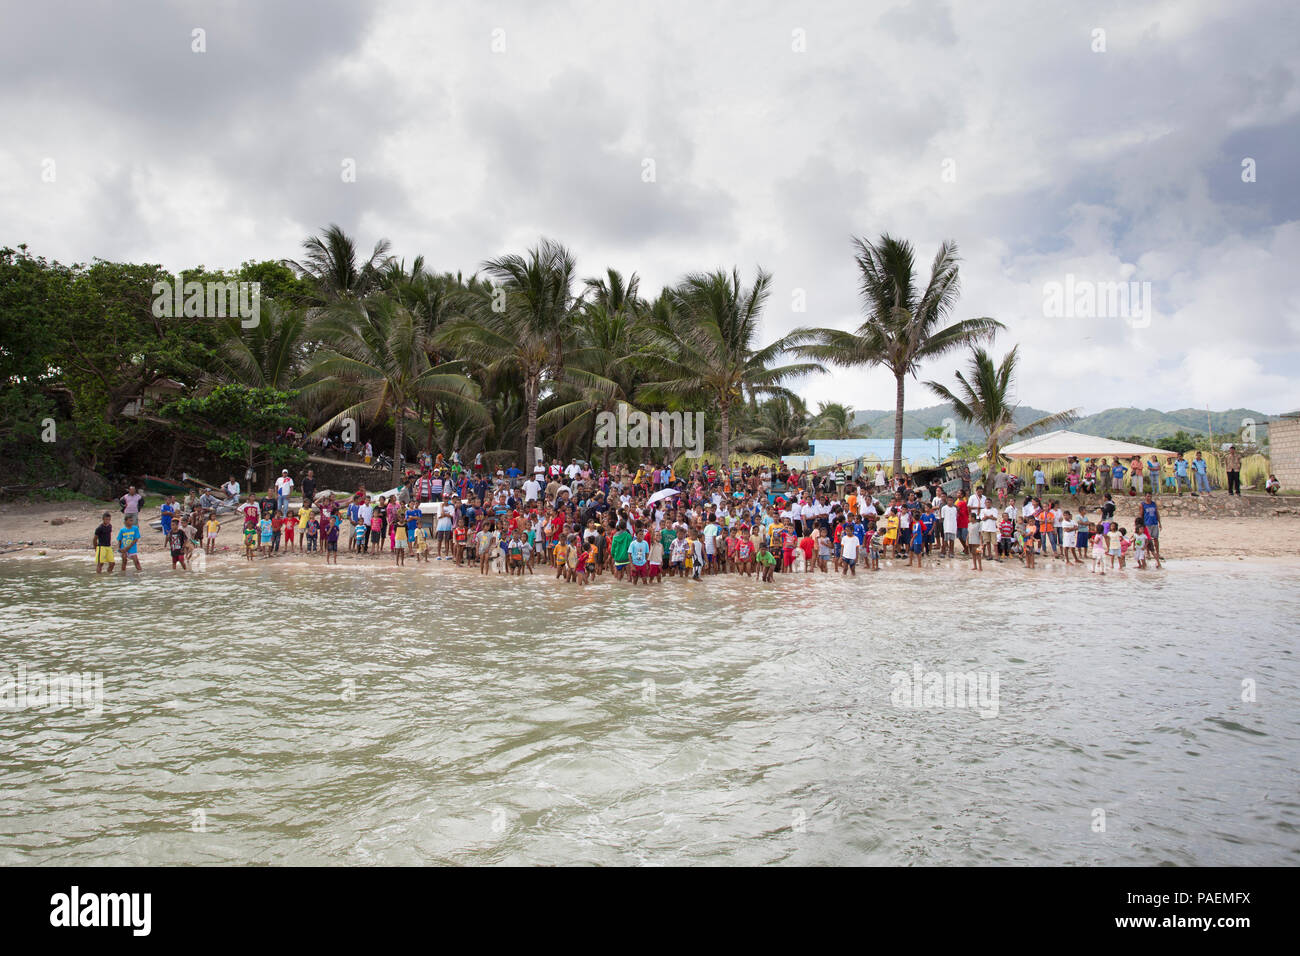 Leti Islanders gather on the beach to bid farewell - Stock Image